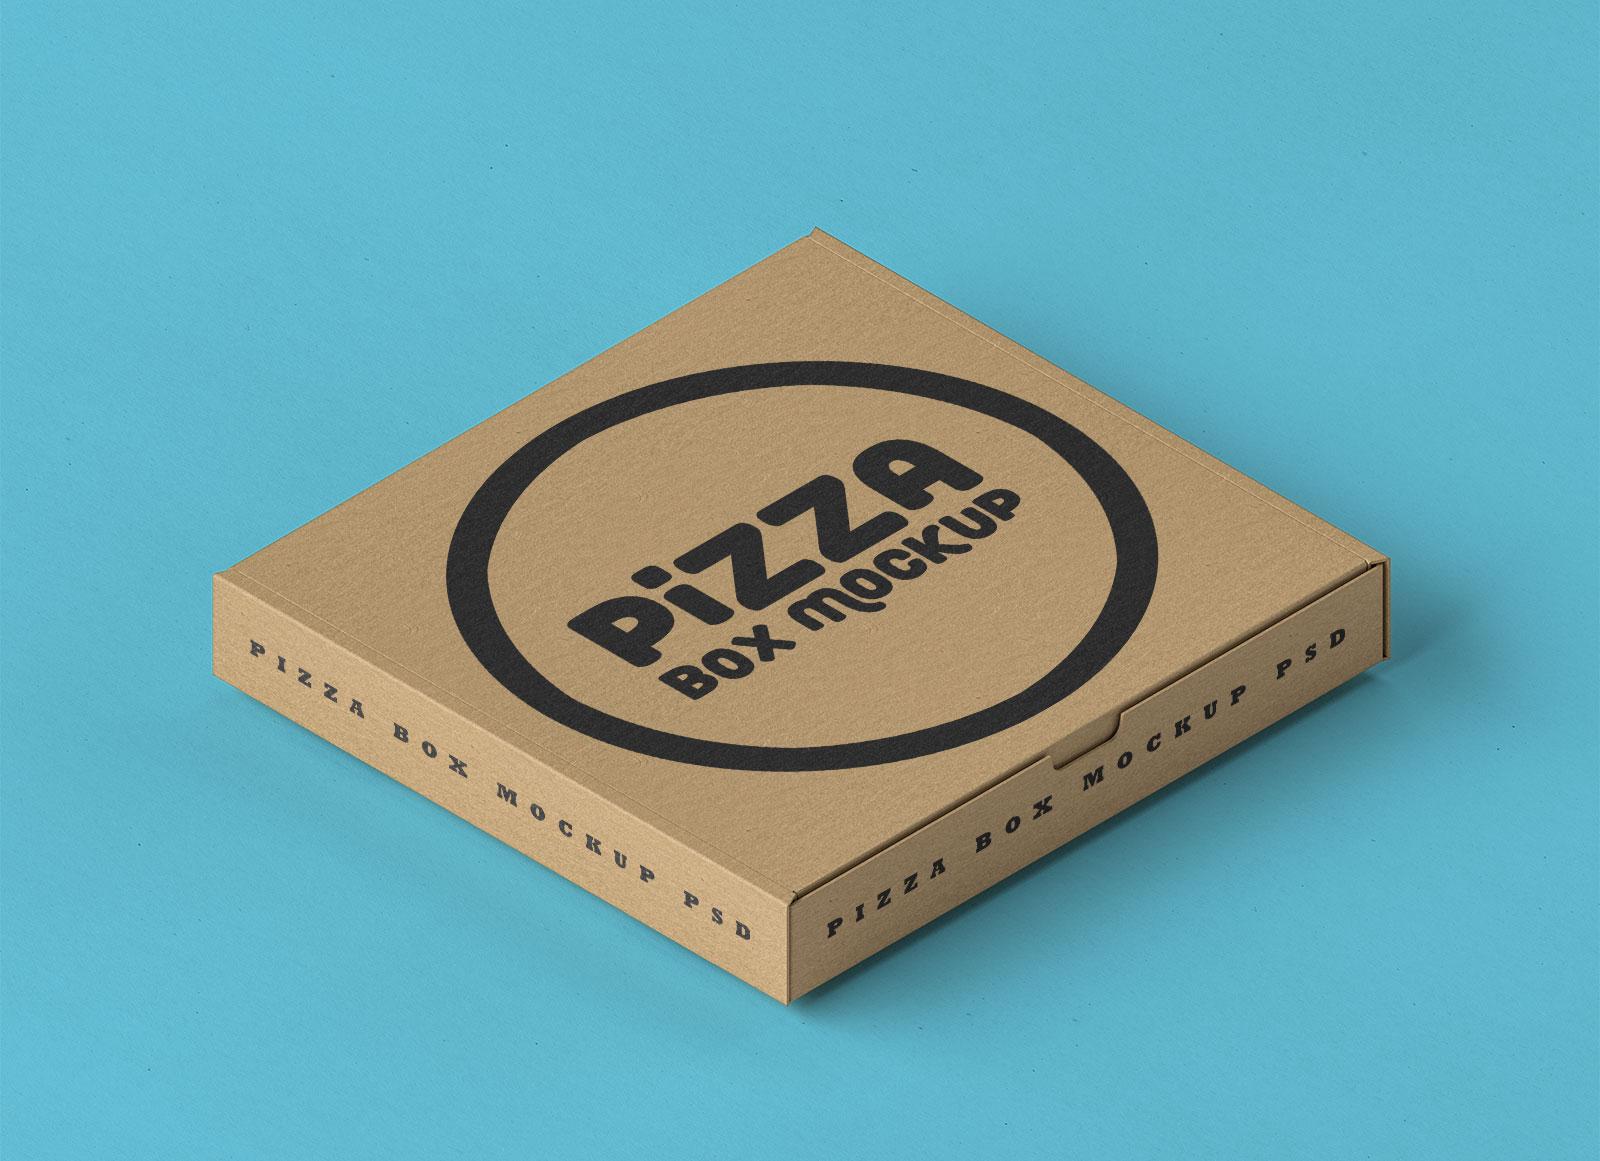 Free-Pizza-Box-Packaging-Mockup-PSD